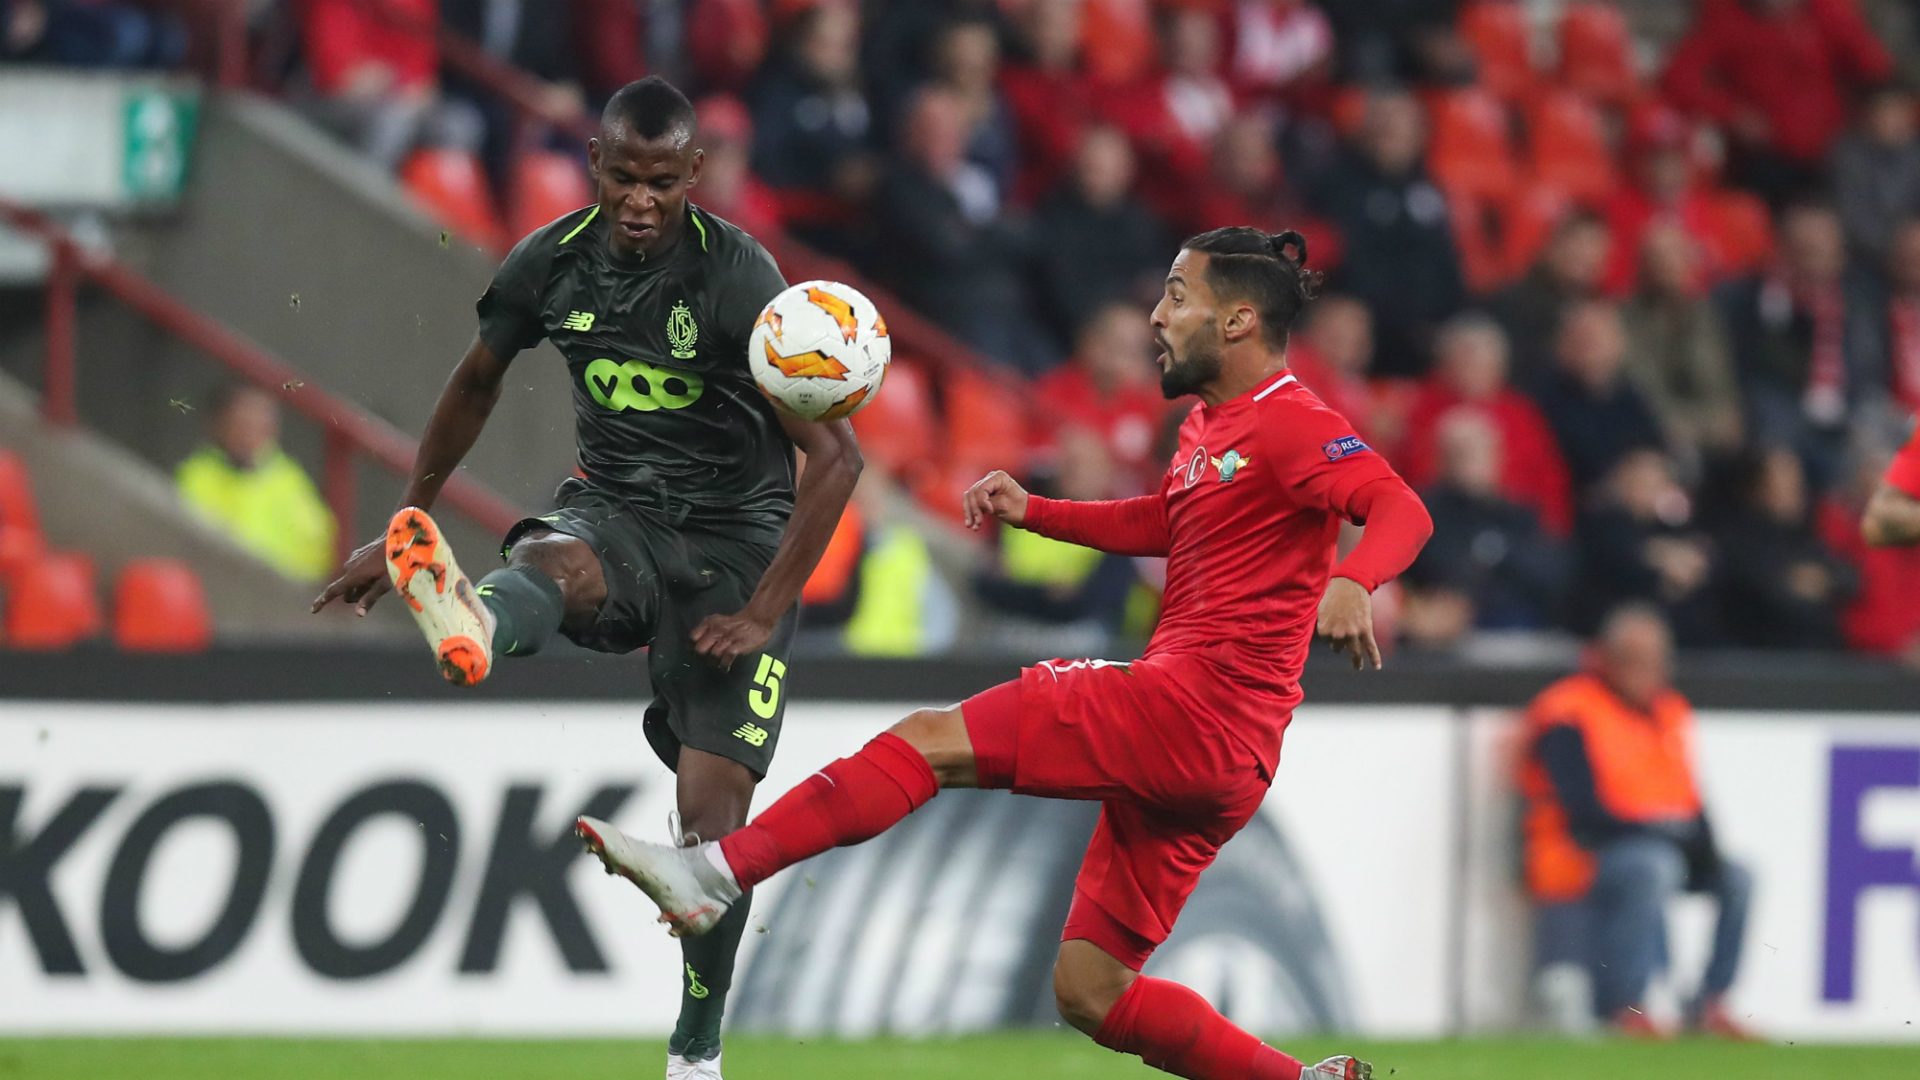 Agbo: Deportivo La Coruna sign former Watford midfielder from Standard Liege